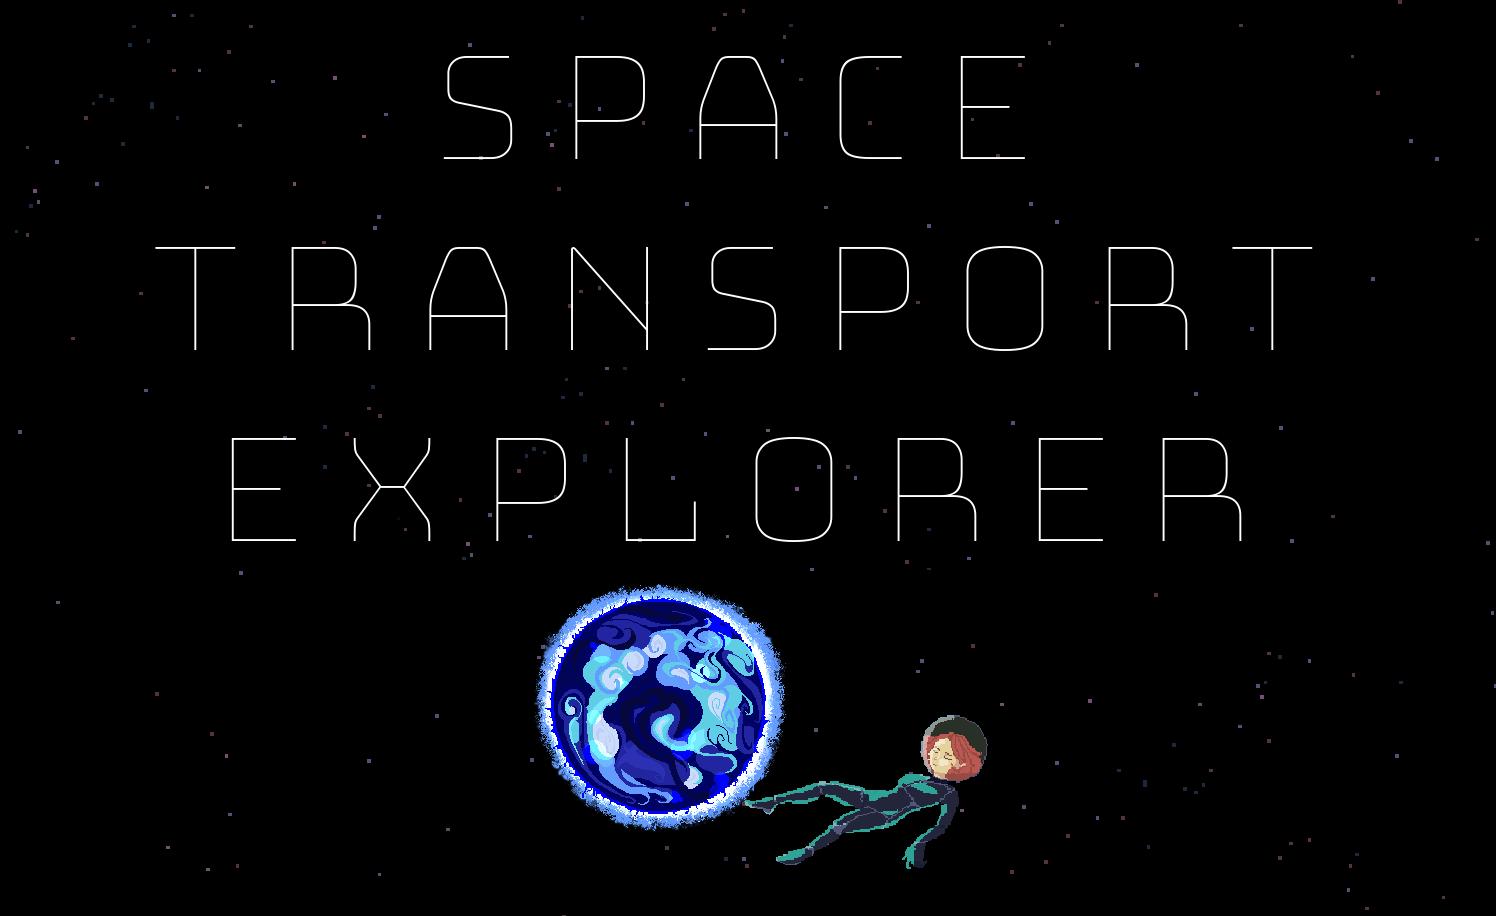 Space Transport Explorer